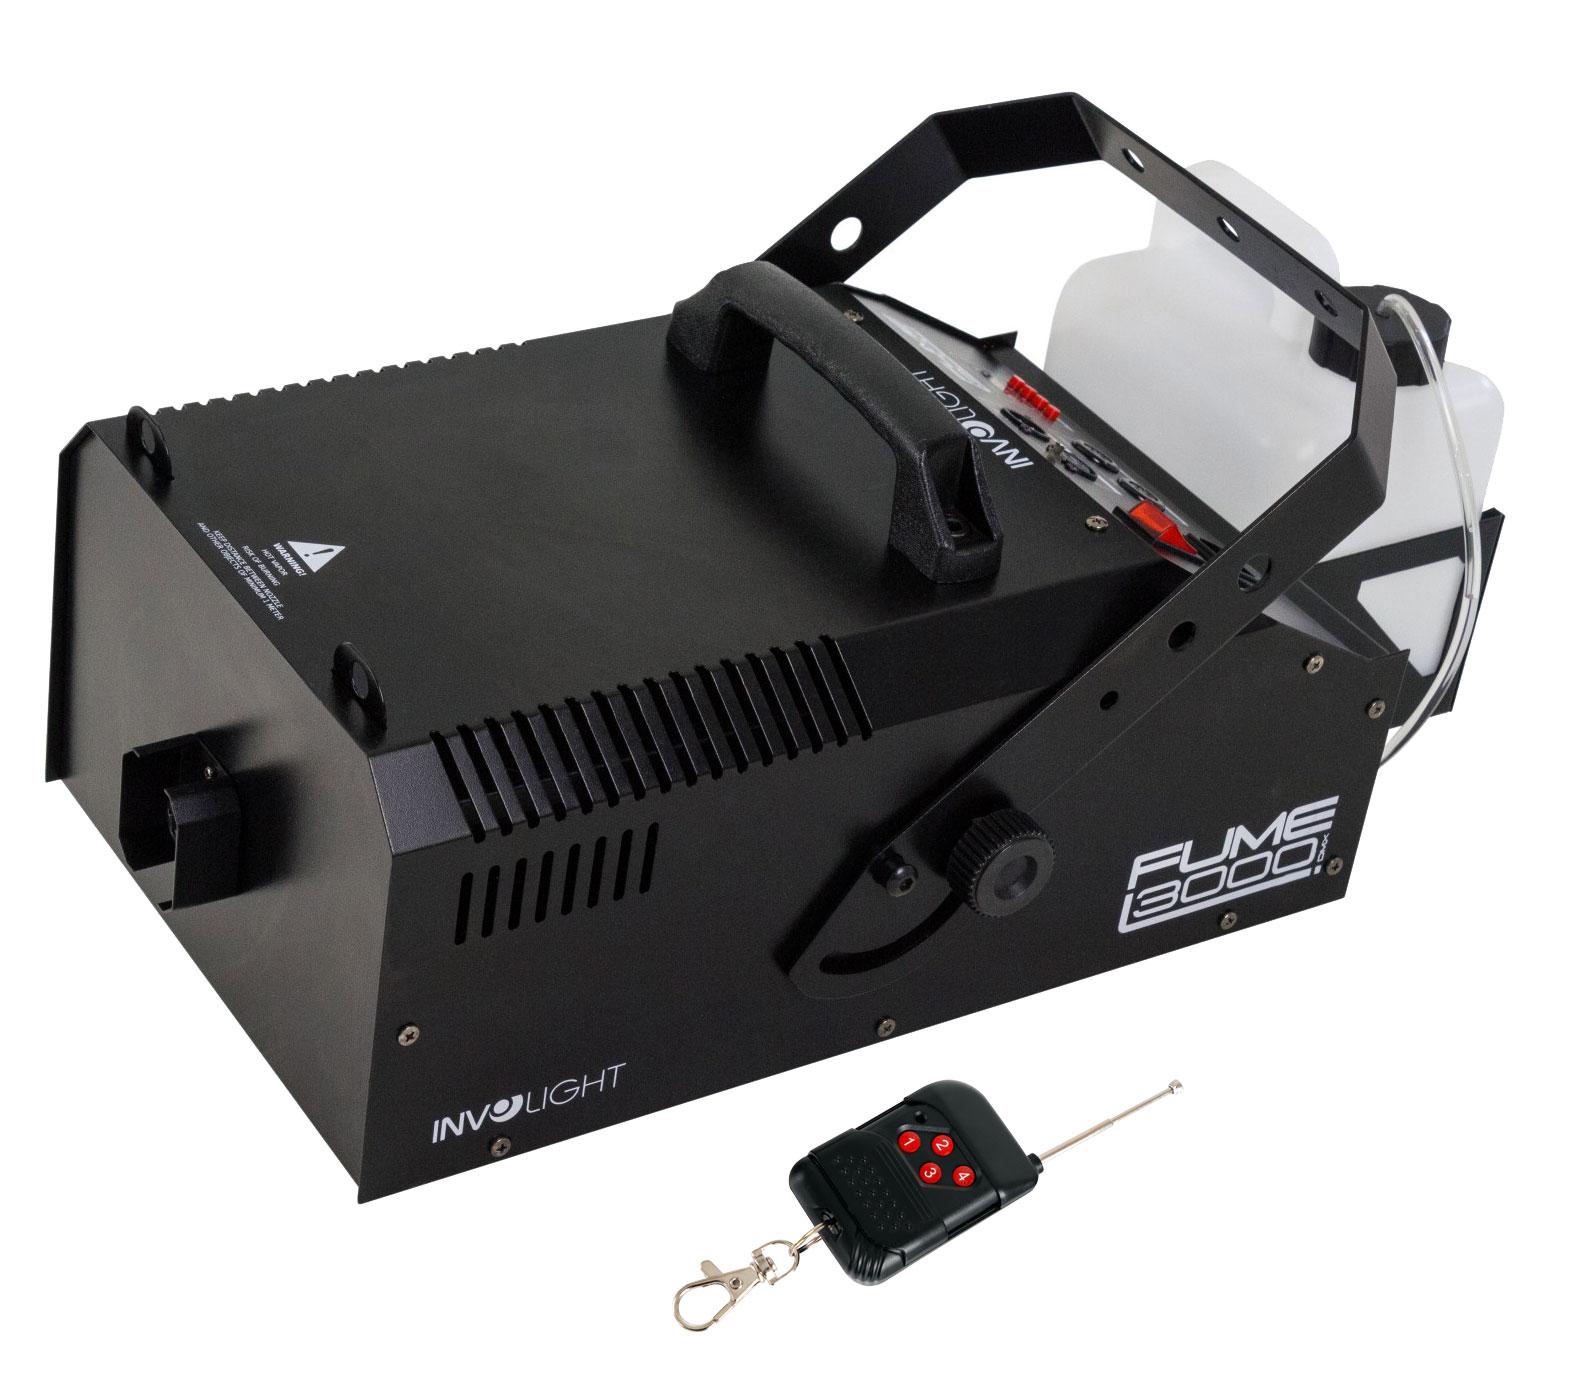 Nebeleffekte - Involight Fume 3000 DMX Nebelmaschine - Onlineshop Musikhaus Kirstein